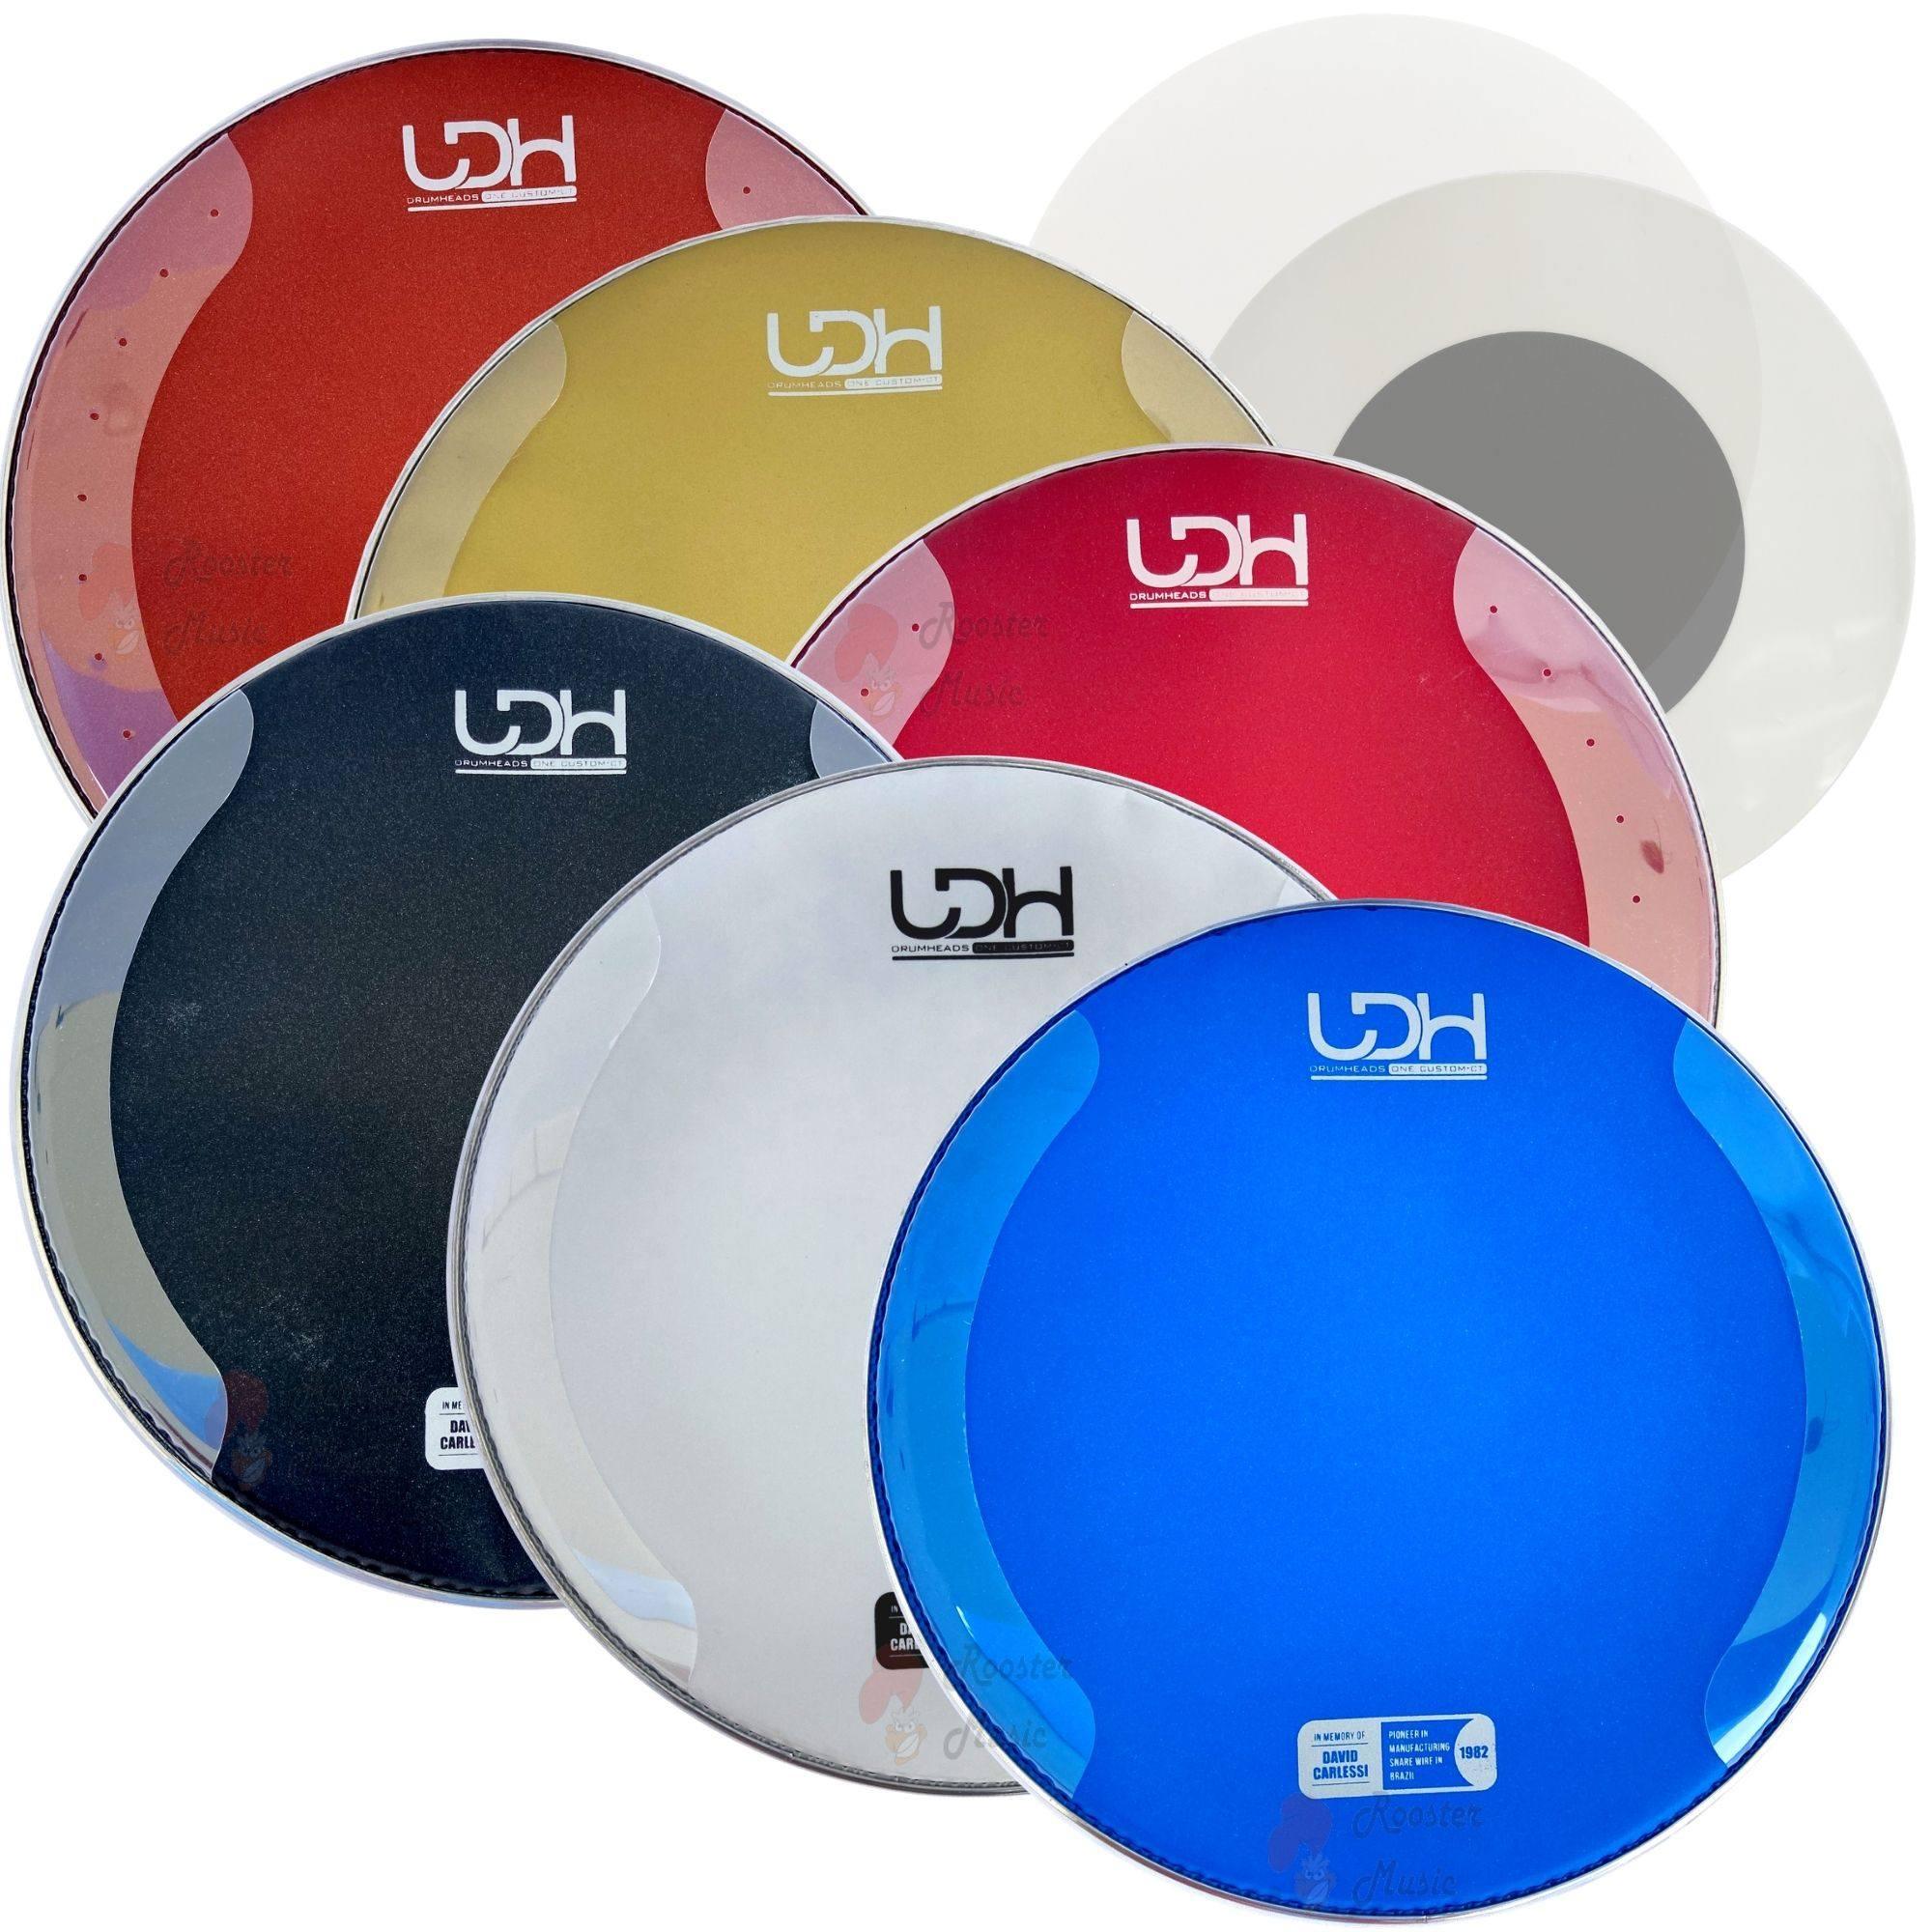 "Pele One Custom Coated CT Luen Drumheads LDH 14"" para Caixa de Bateria."